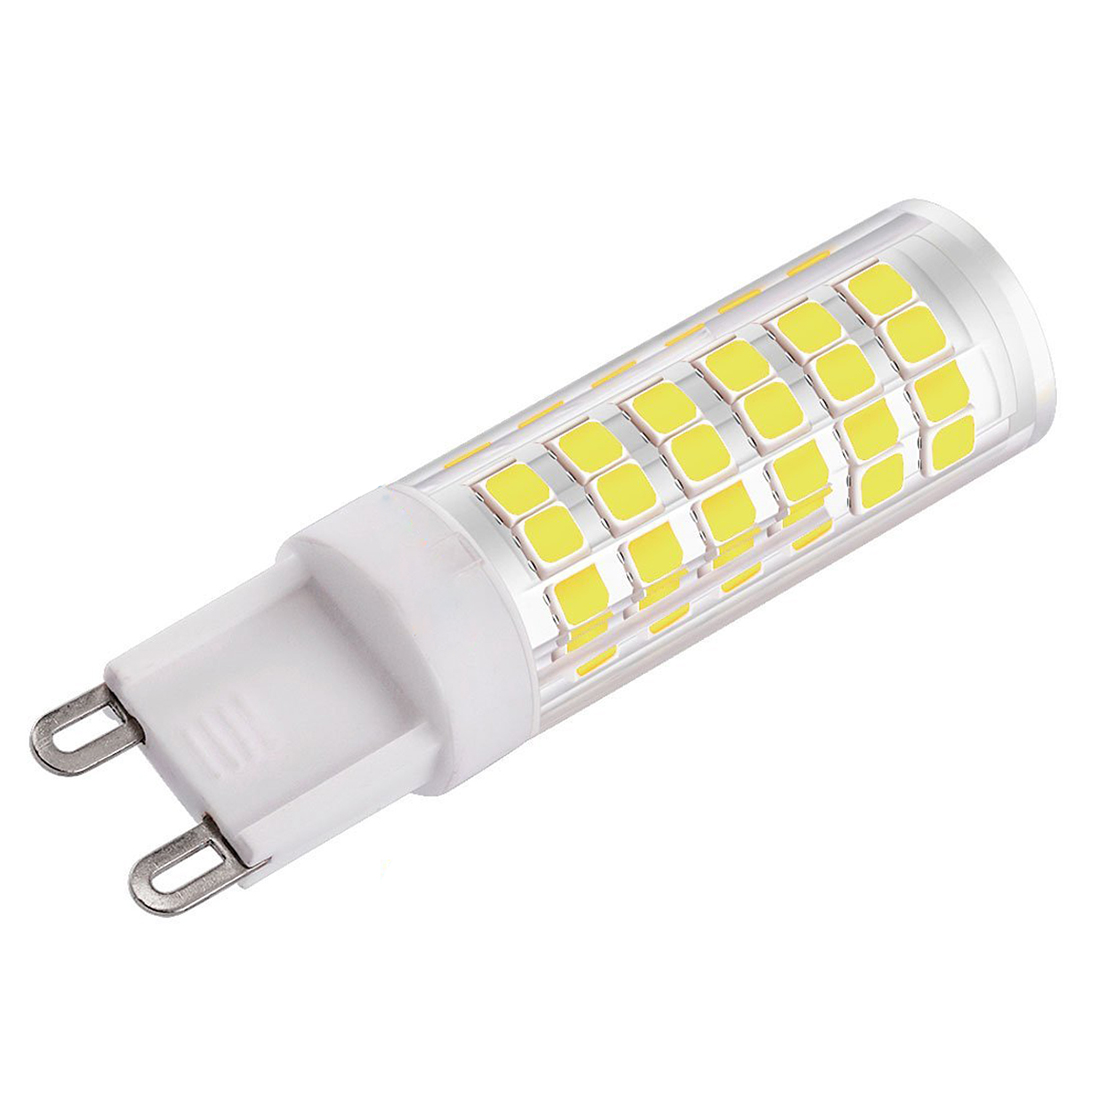 Us 7 01 13 Off 5 Pcs G9 Led Bulb 7w 550lm 60 Watt Halogen Bulbs Equivalent 6000k 360 Degree Beam Angle Energy Class A Daylight White In Led